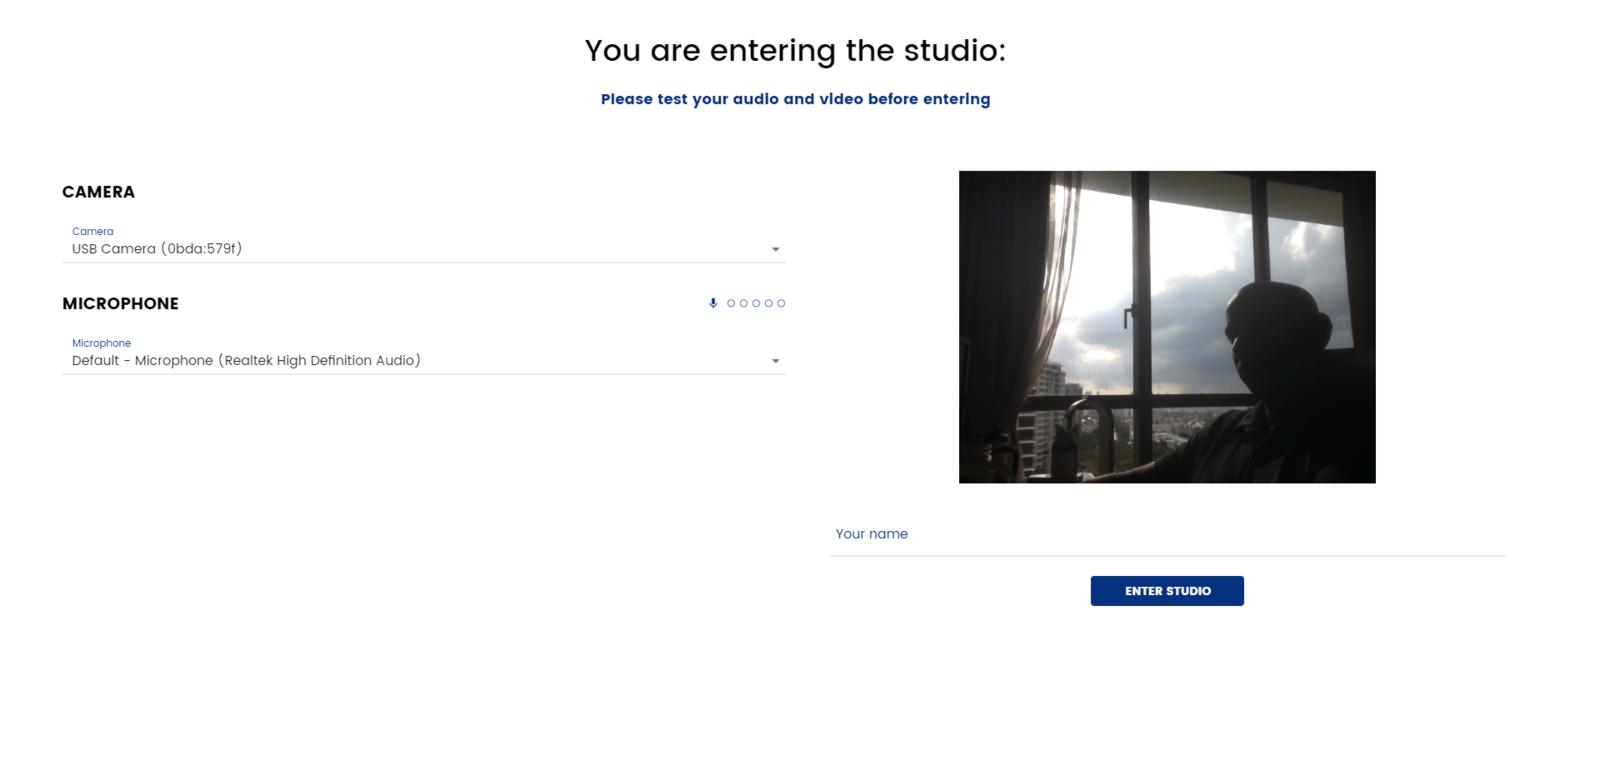 entering studio